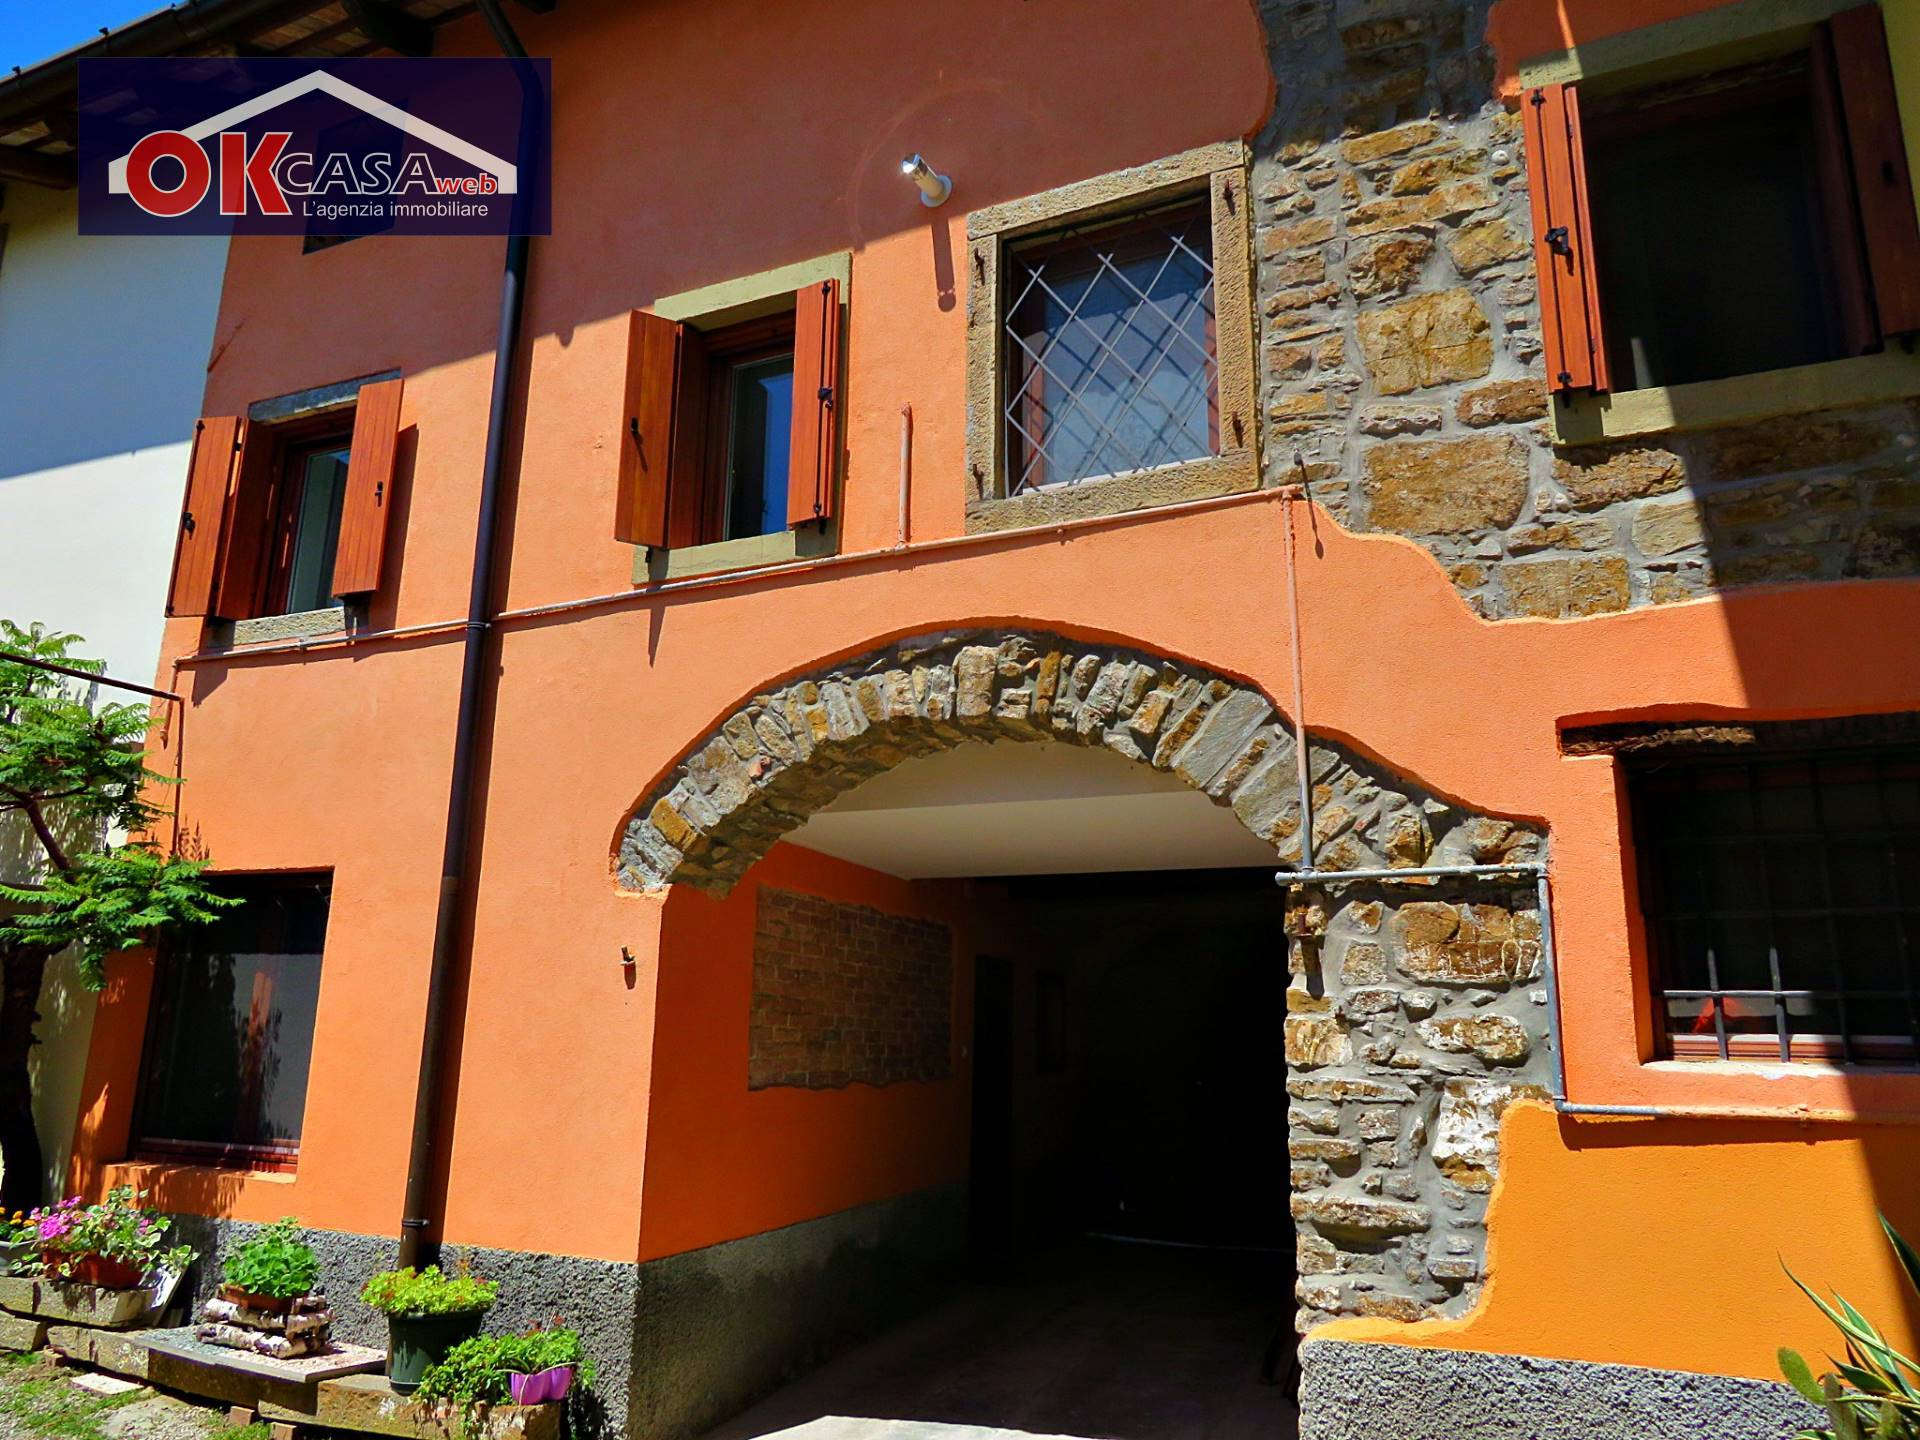 Immobile | Gorizia, Cormons, via san giovanni